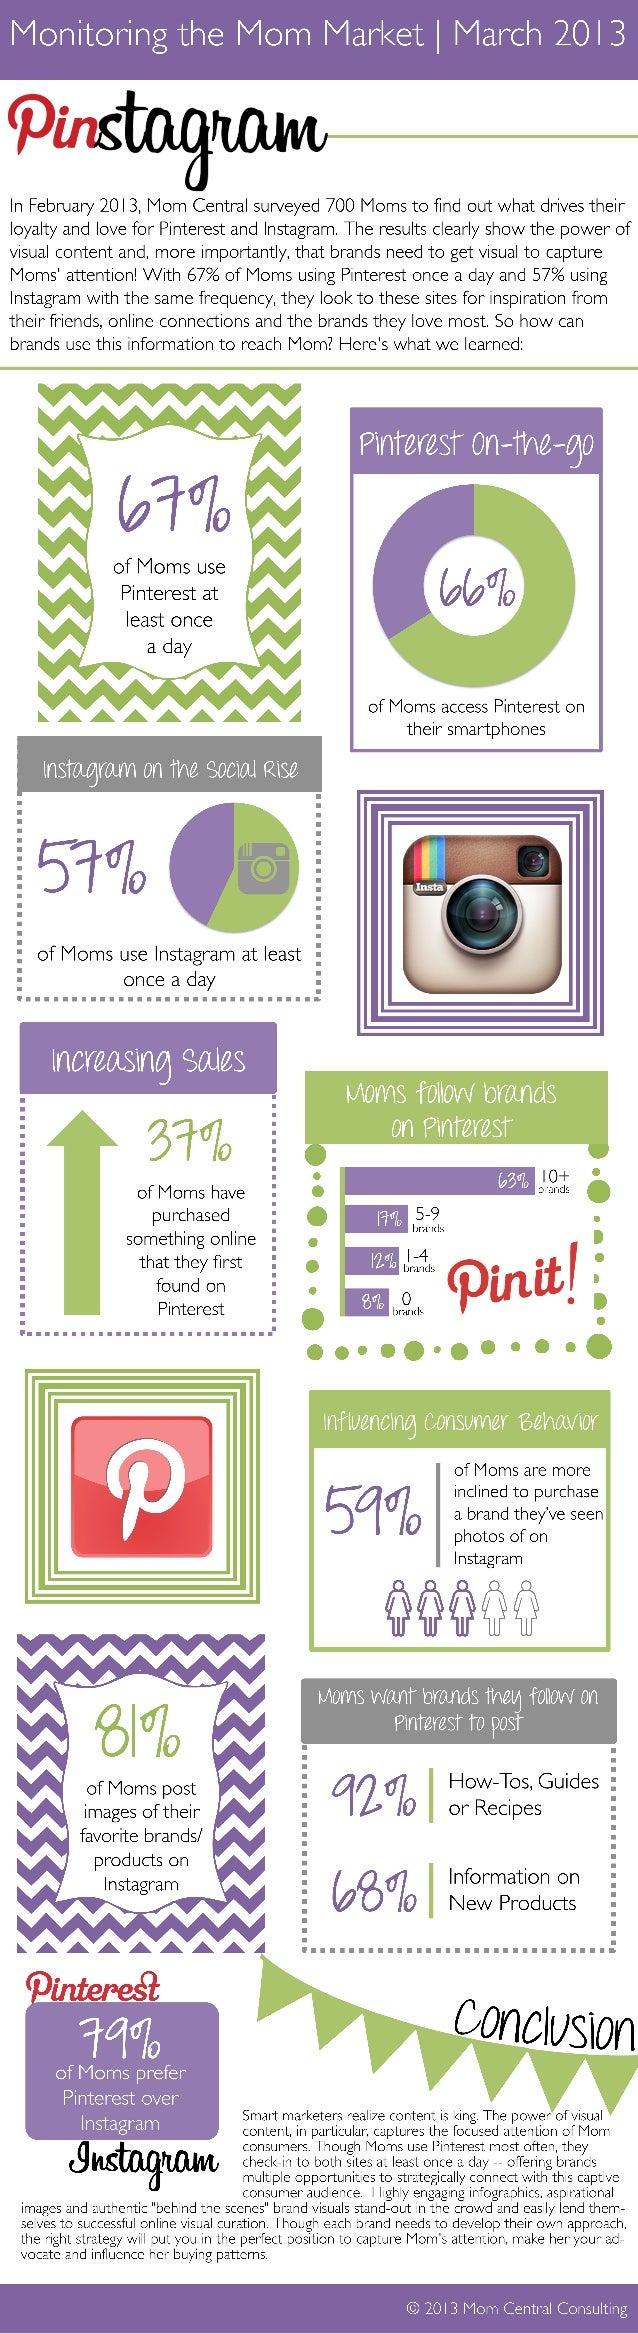 Monitoring the Mom Market: Pinterest Versus Instagram